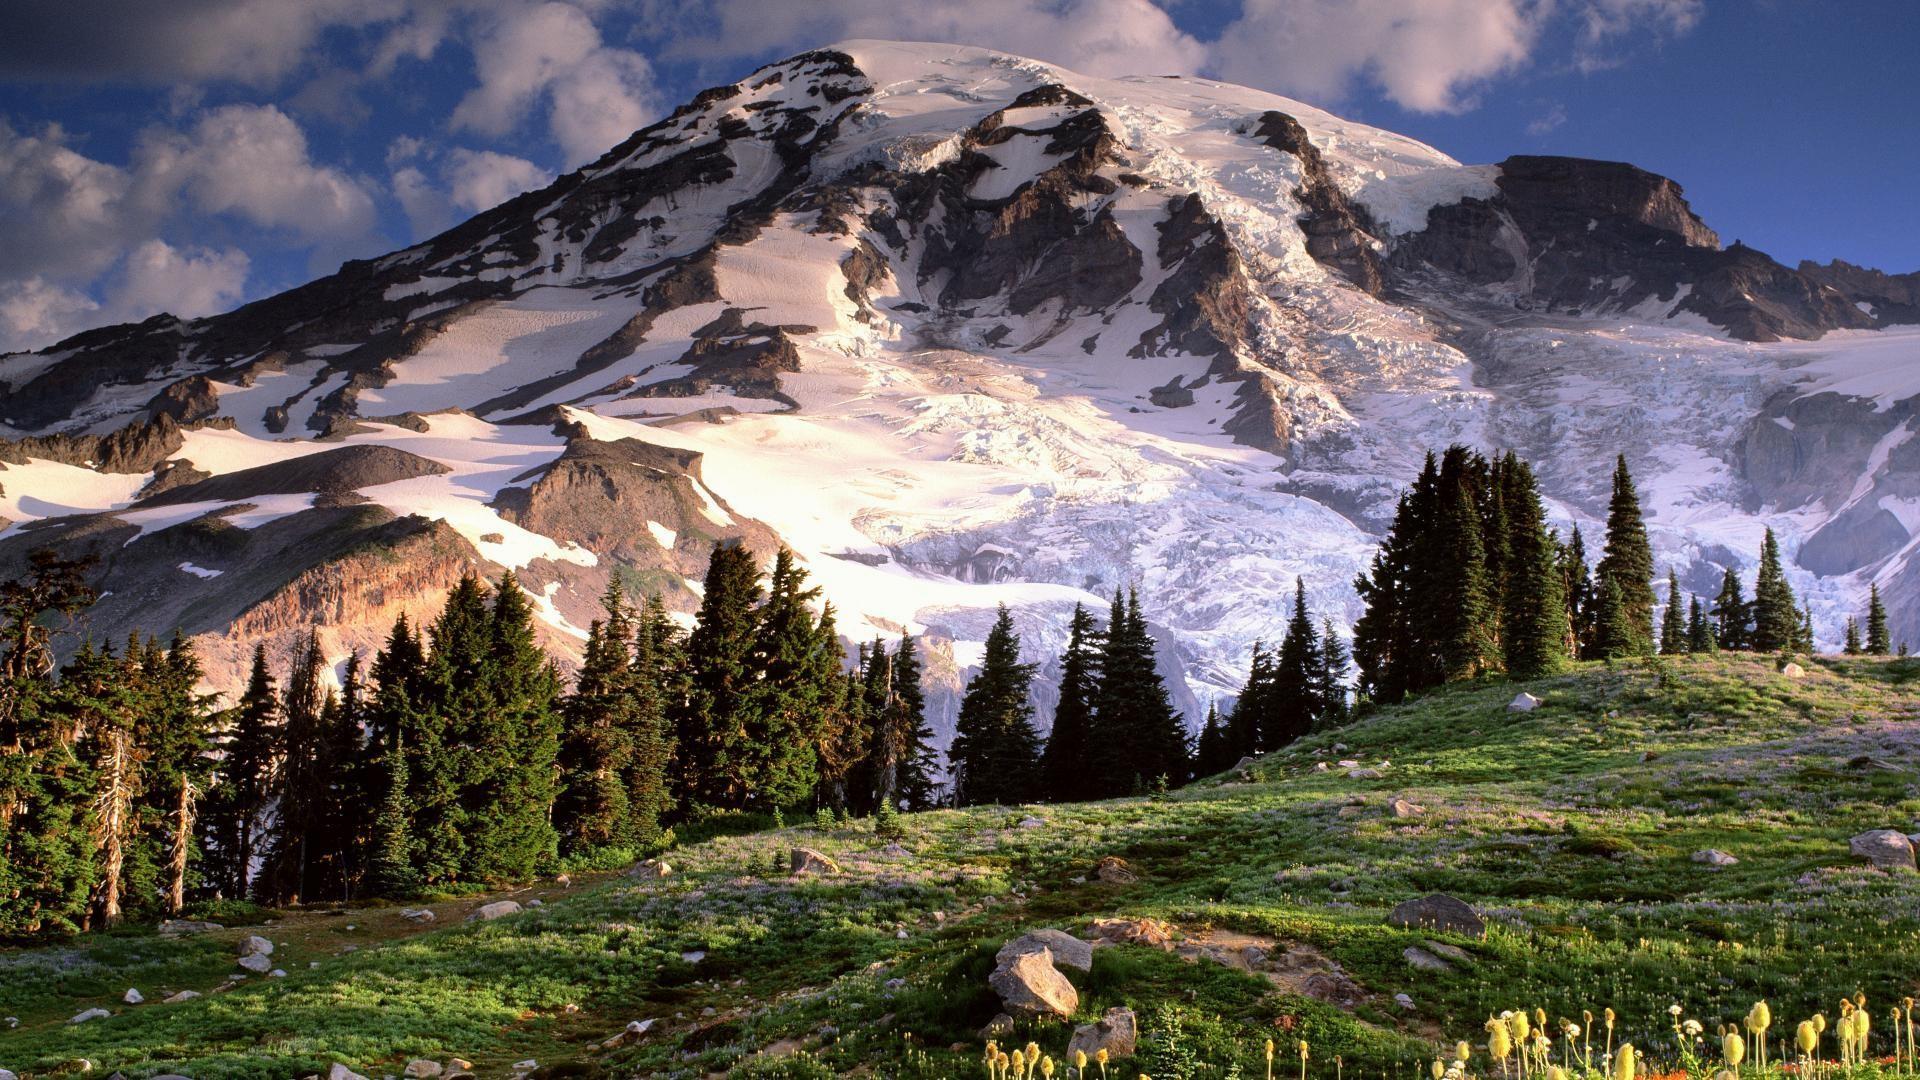 Wiki Mount Everest From The Ground Wallpaper Data Mt Rainier High Resolution 1920x1080 Wallpaper Teahub Io